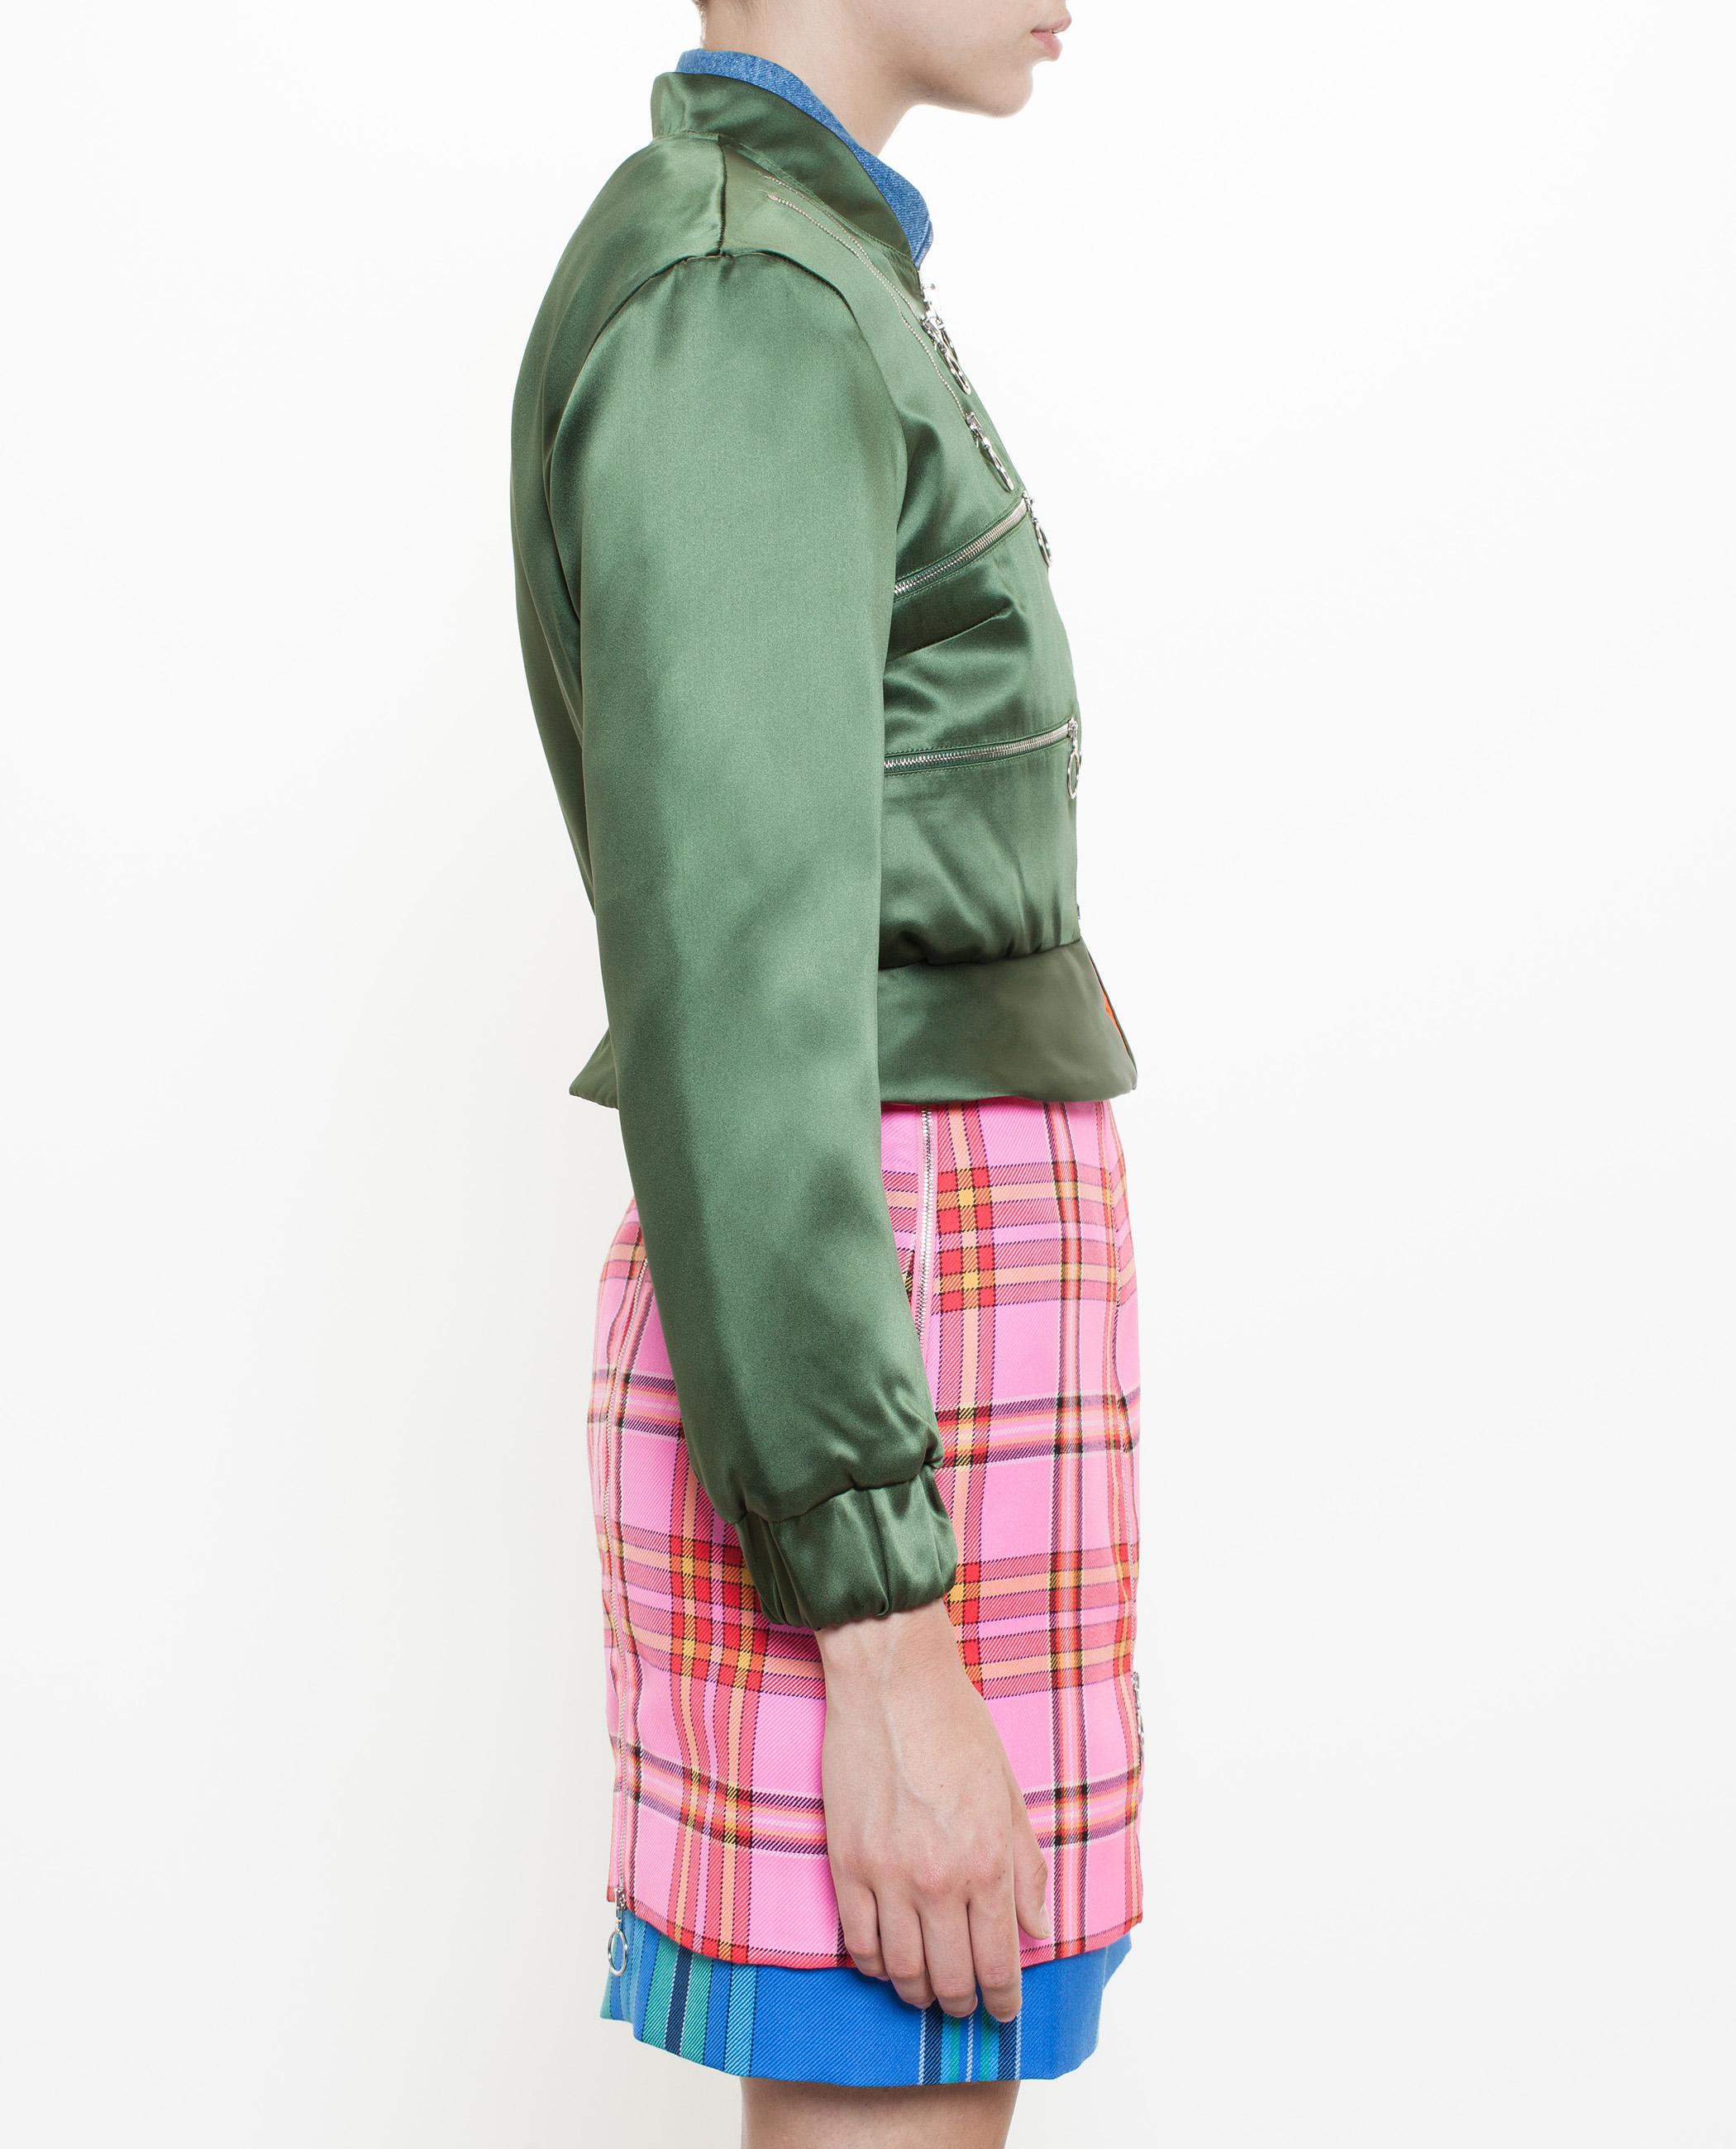 House design jacket - Gallery